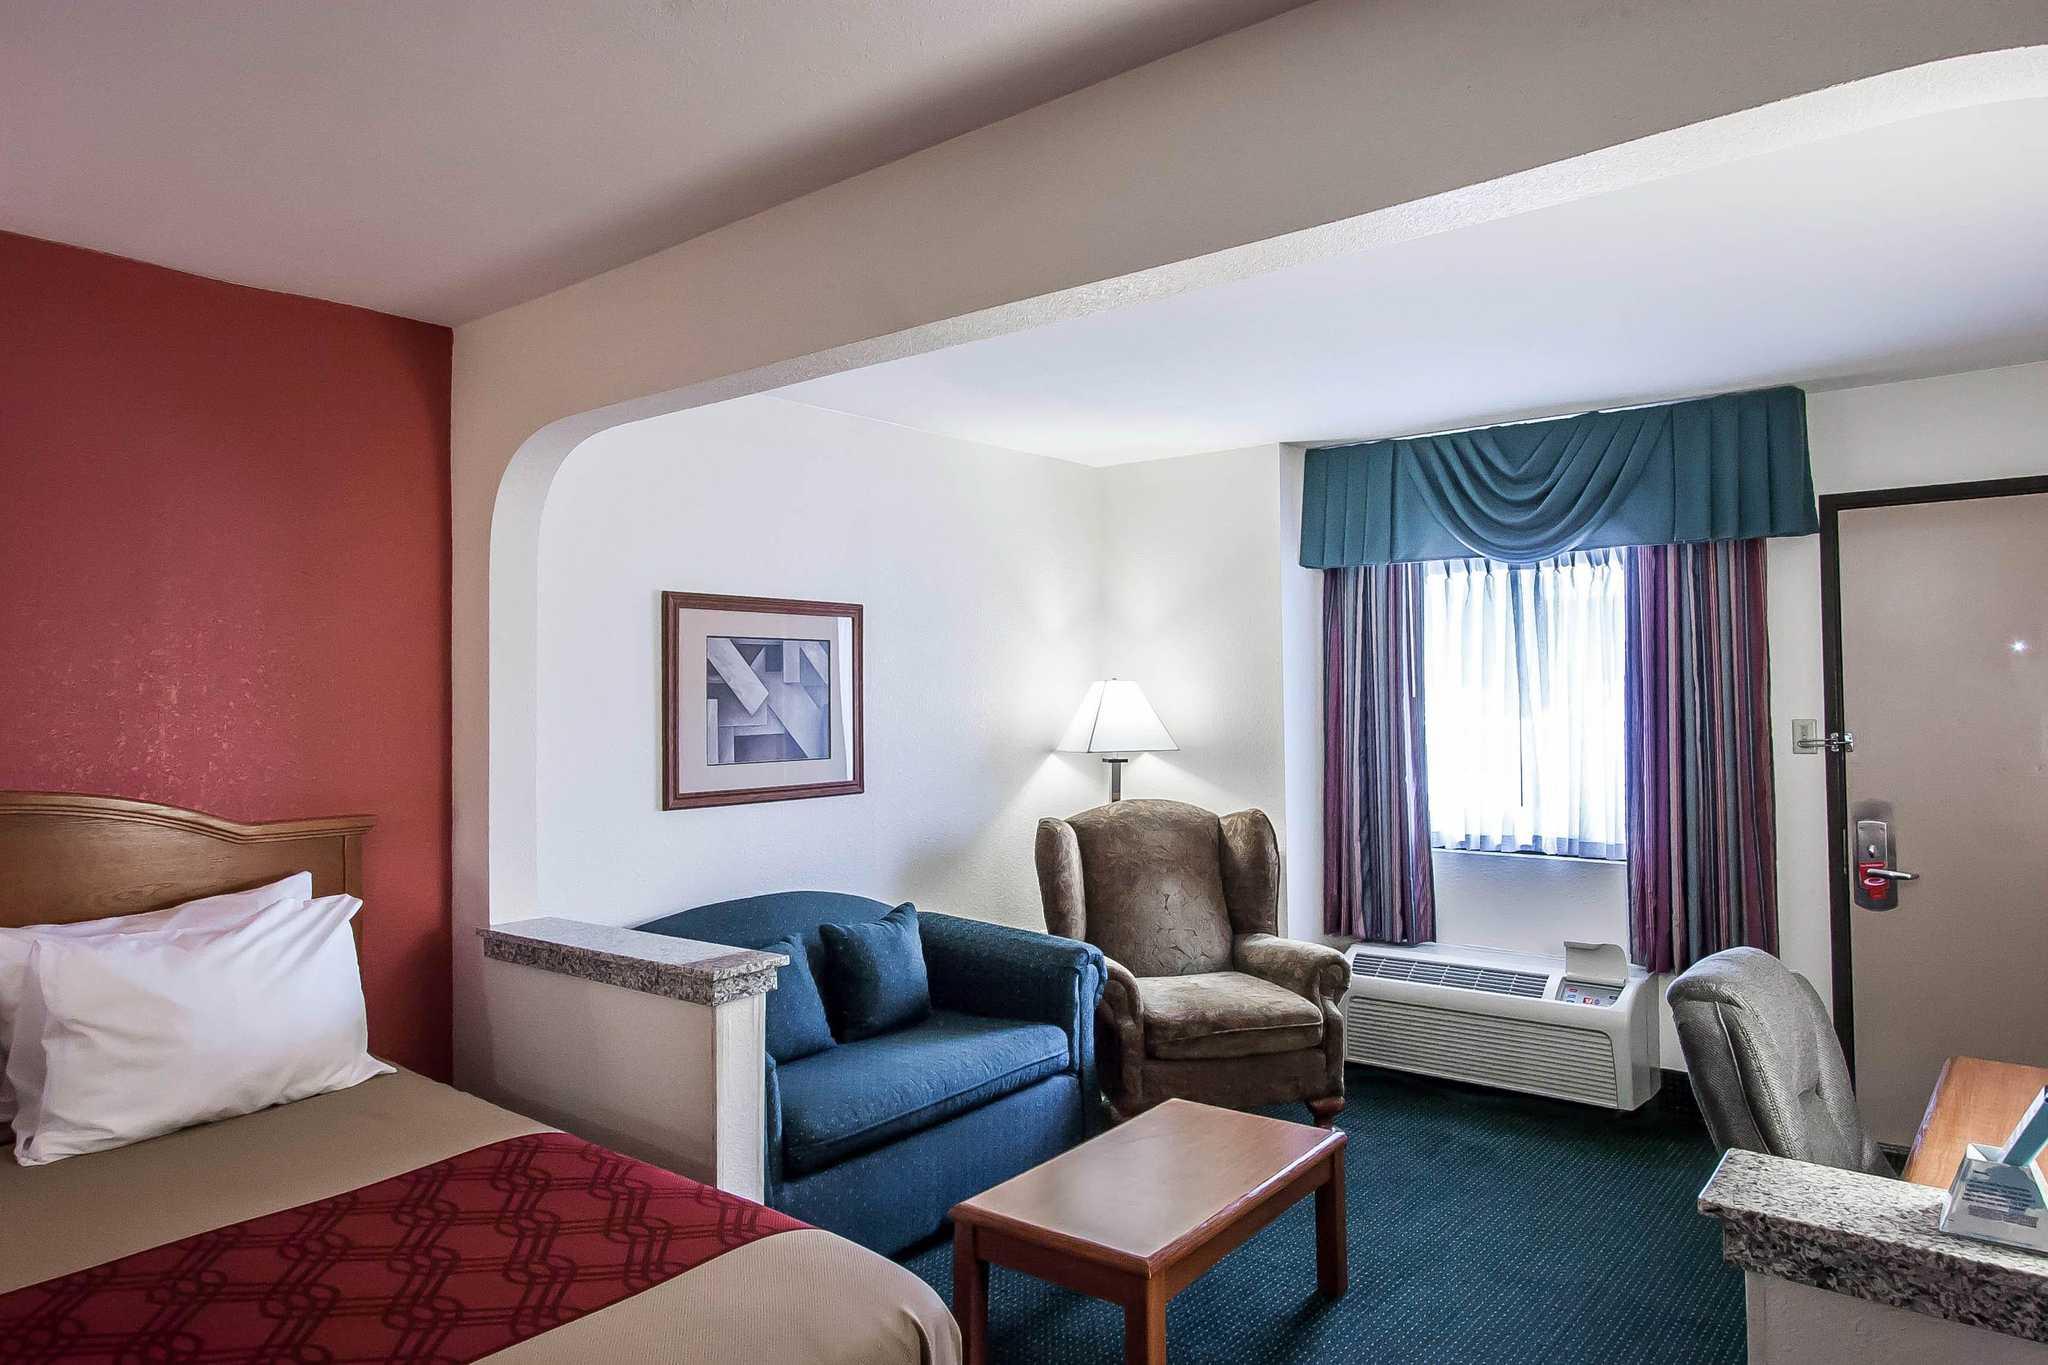 Econo Lodge Inn Amp Suites Coupons Memphis Tn Near Me 8coupons